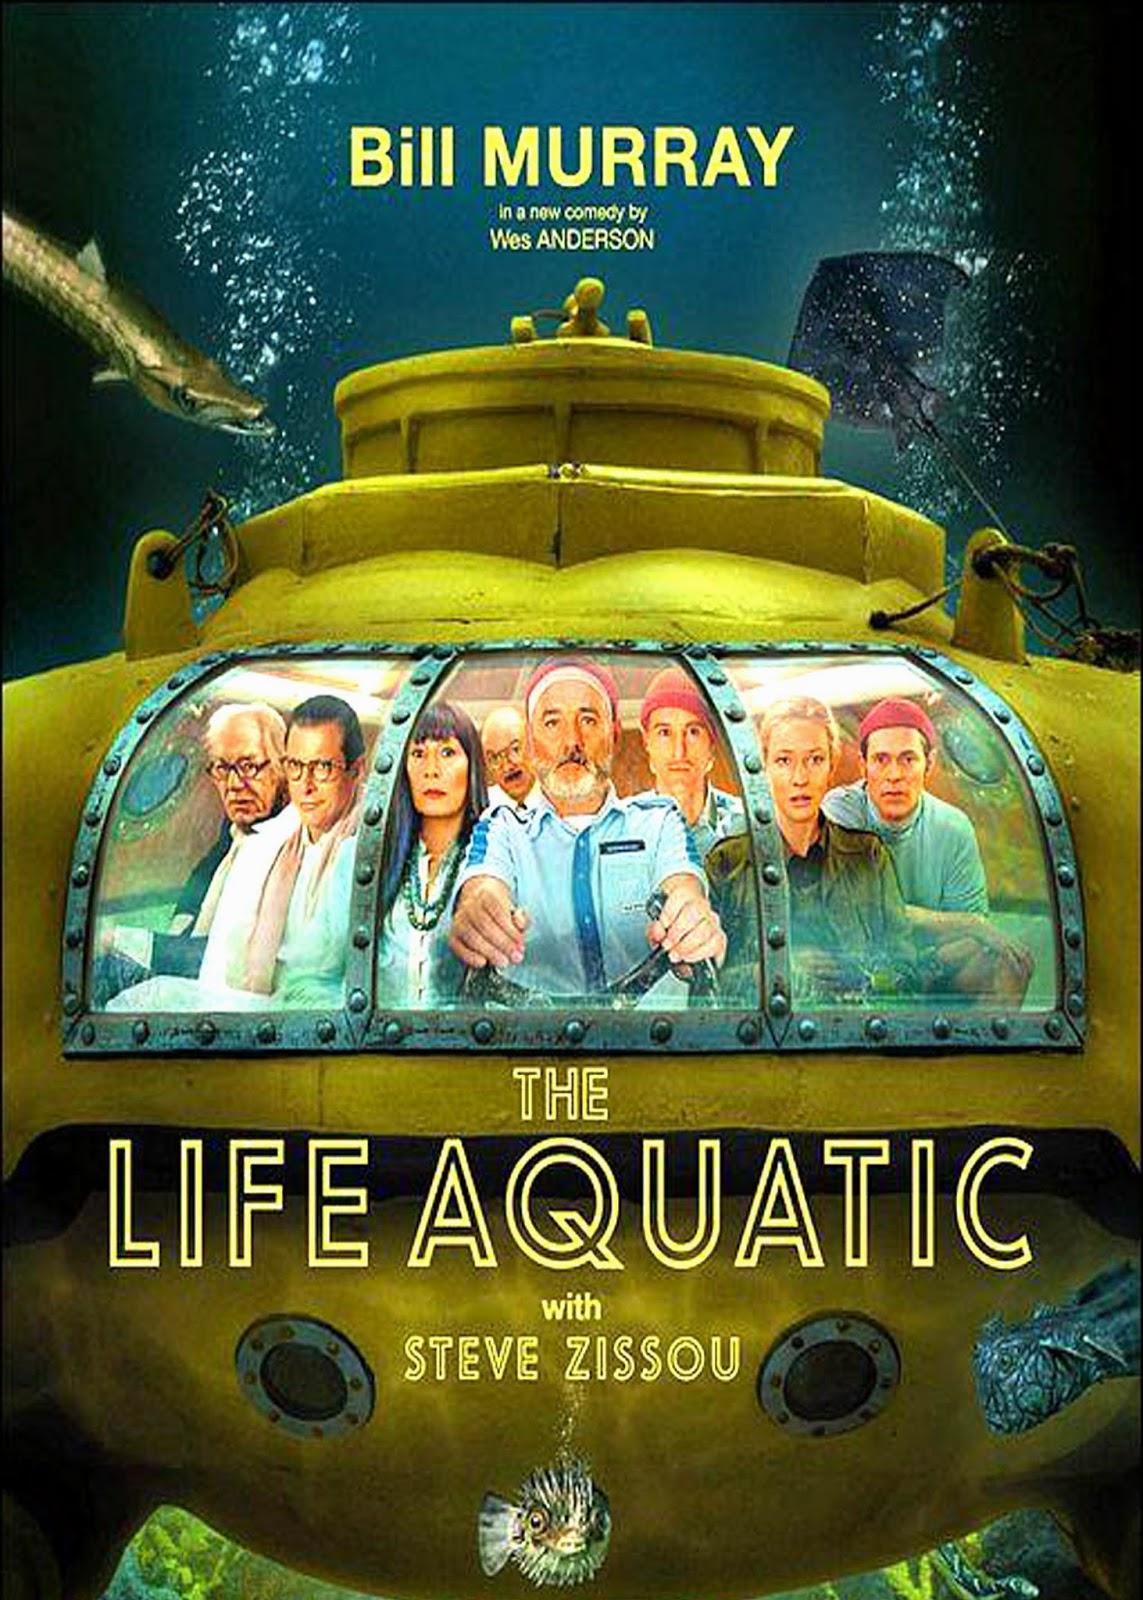 La vida acuatica (2004) Comedia